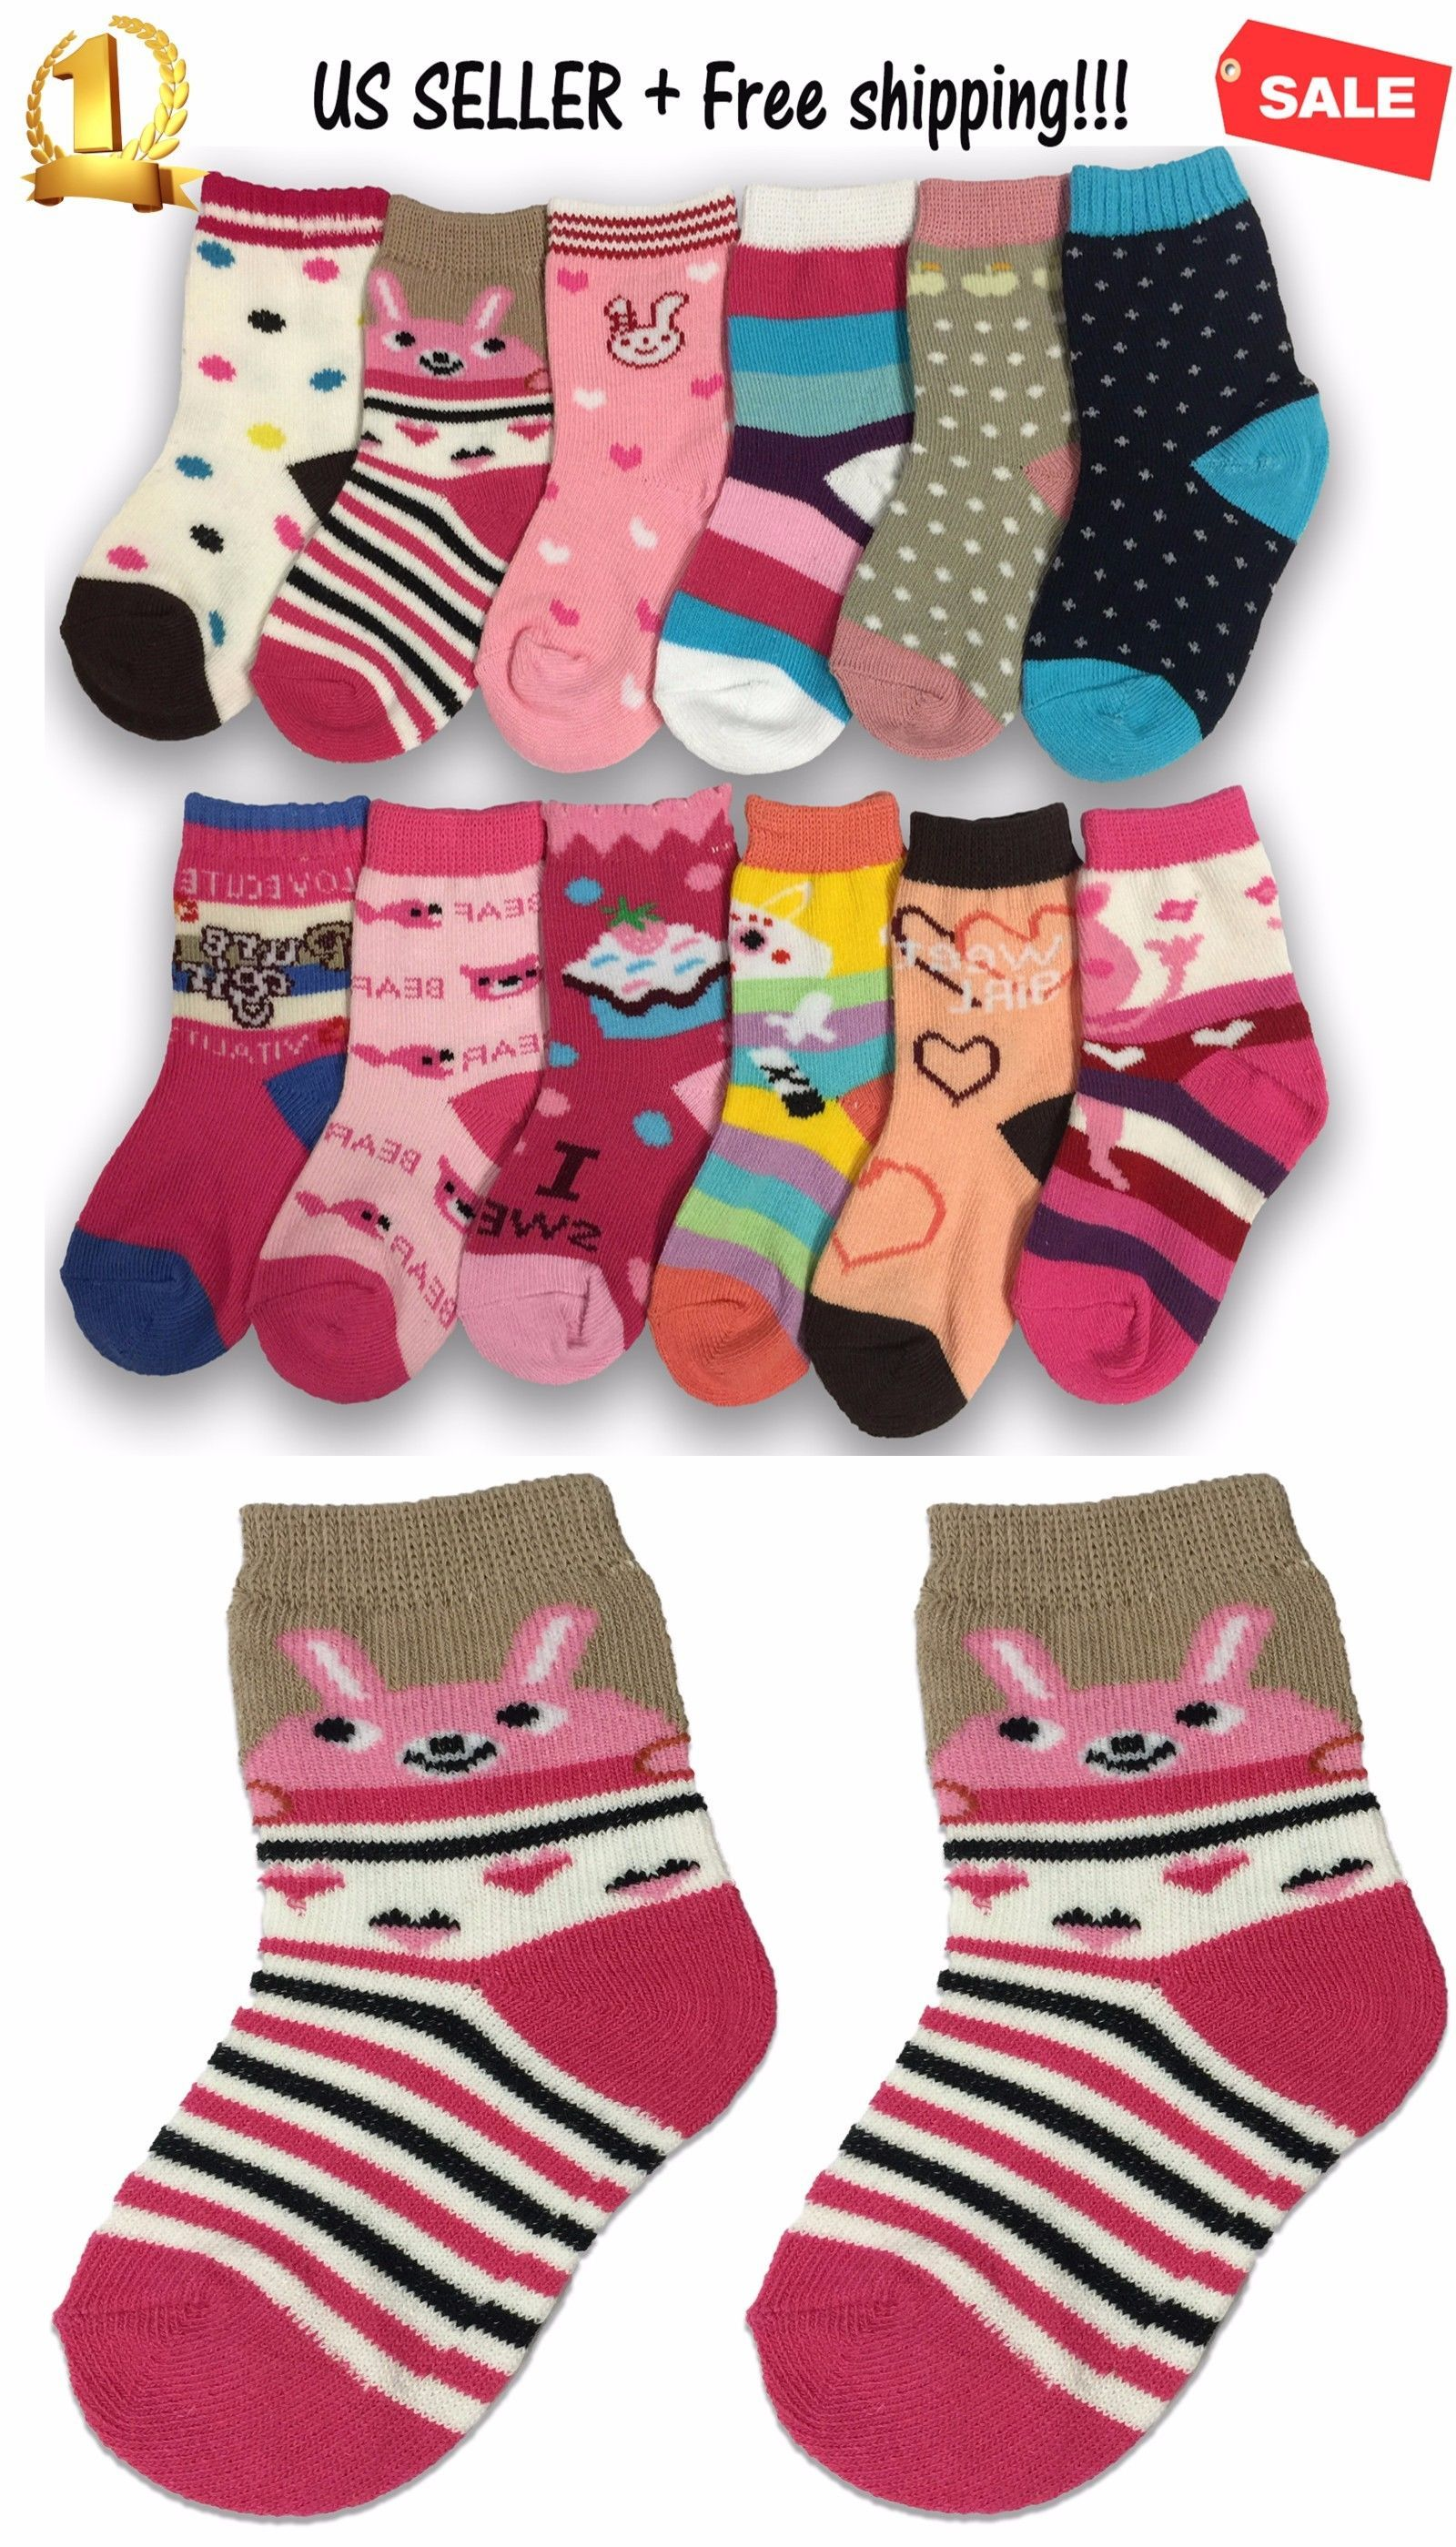 Socks and Tights 3 6 12 Pairs Yanoir Girls Ankle Cut Socks